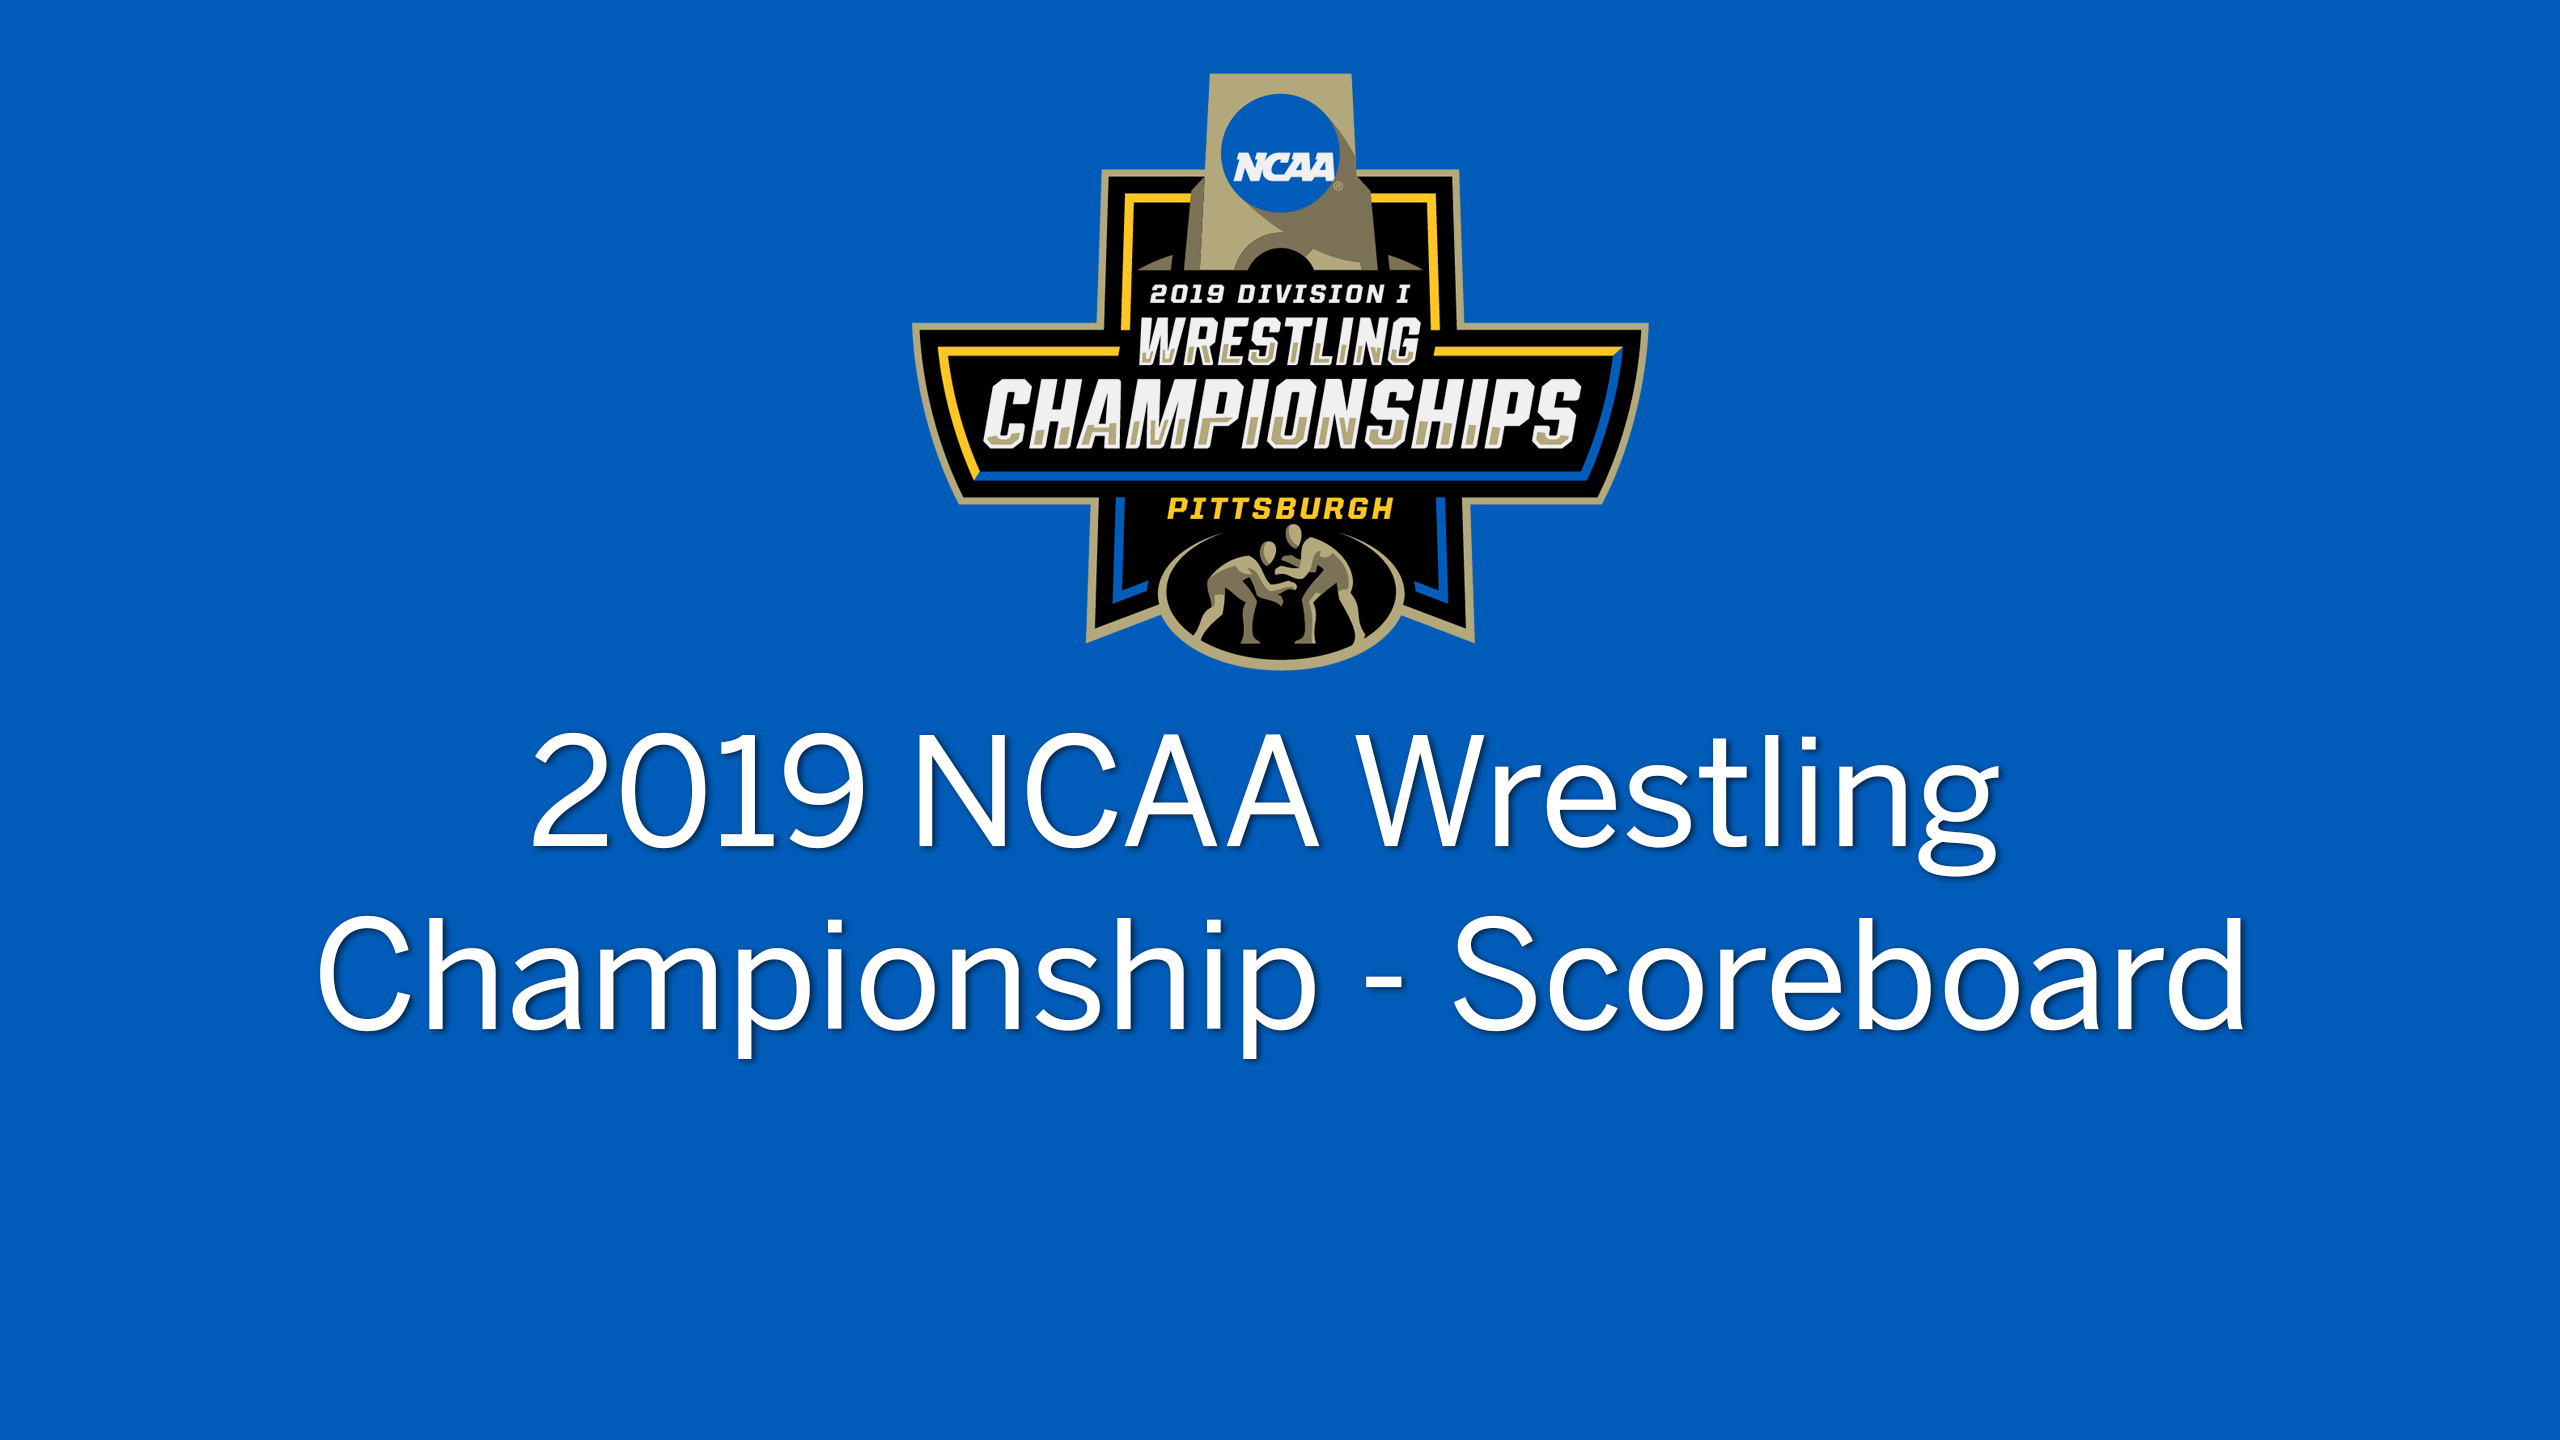 NCAA Wrestling Championship (Scoreboard - Second Round)